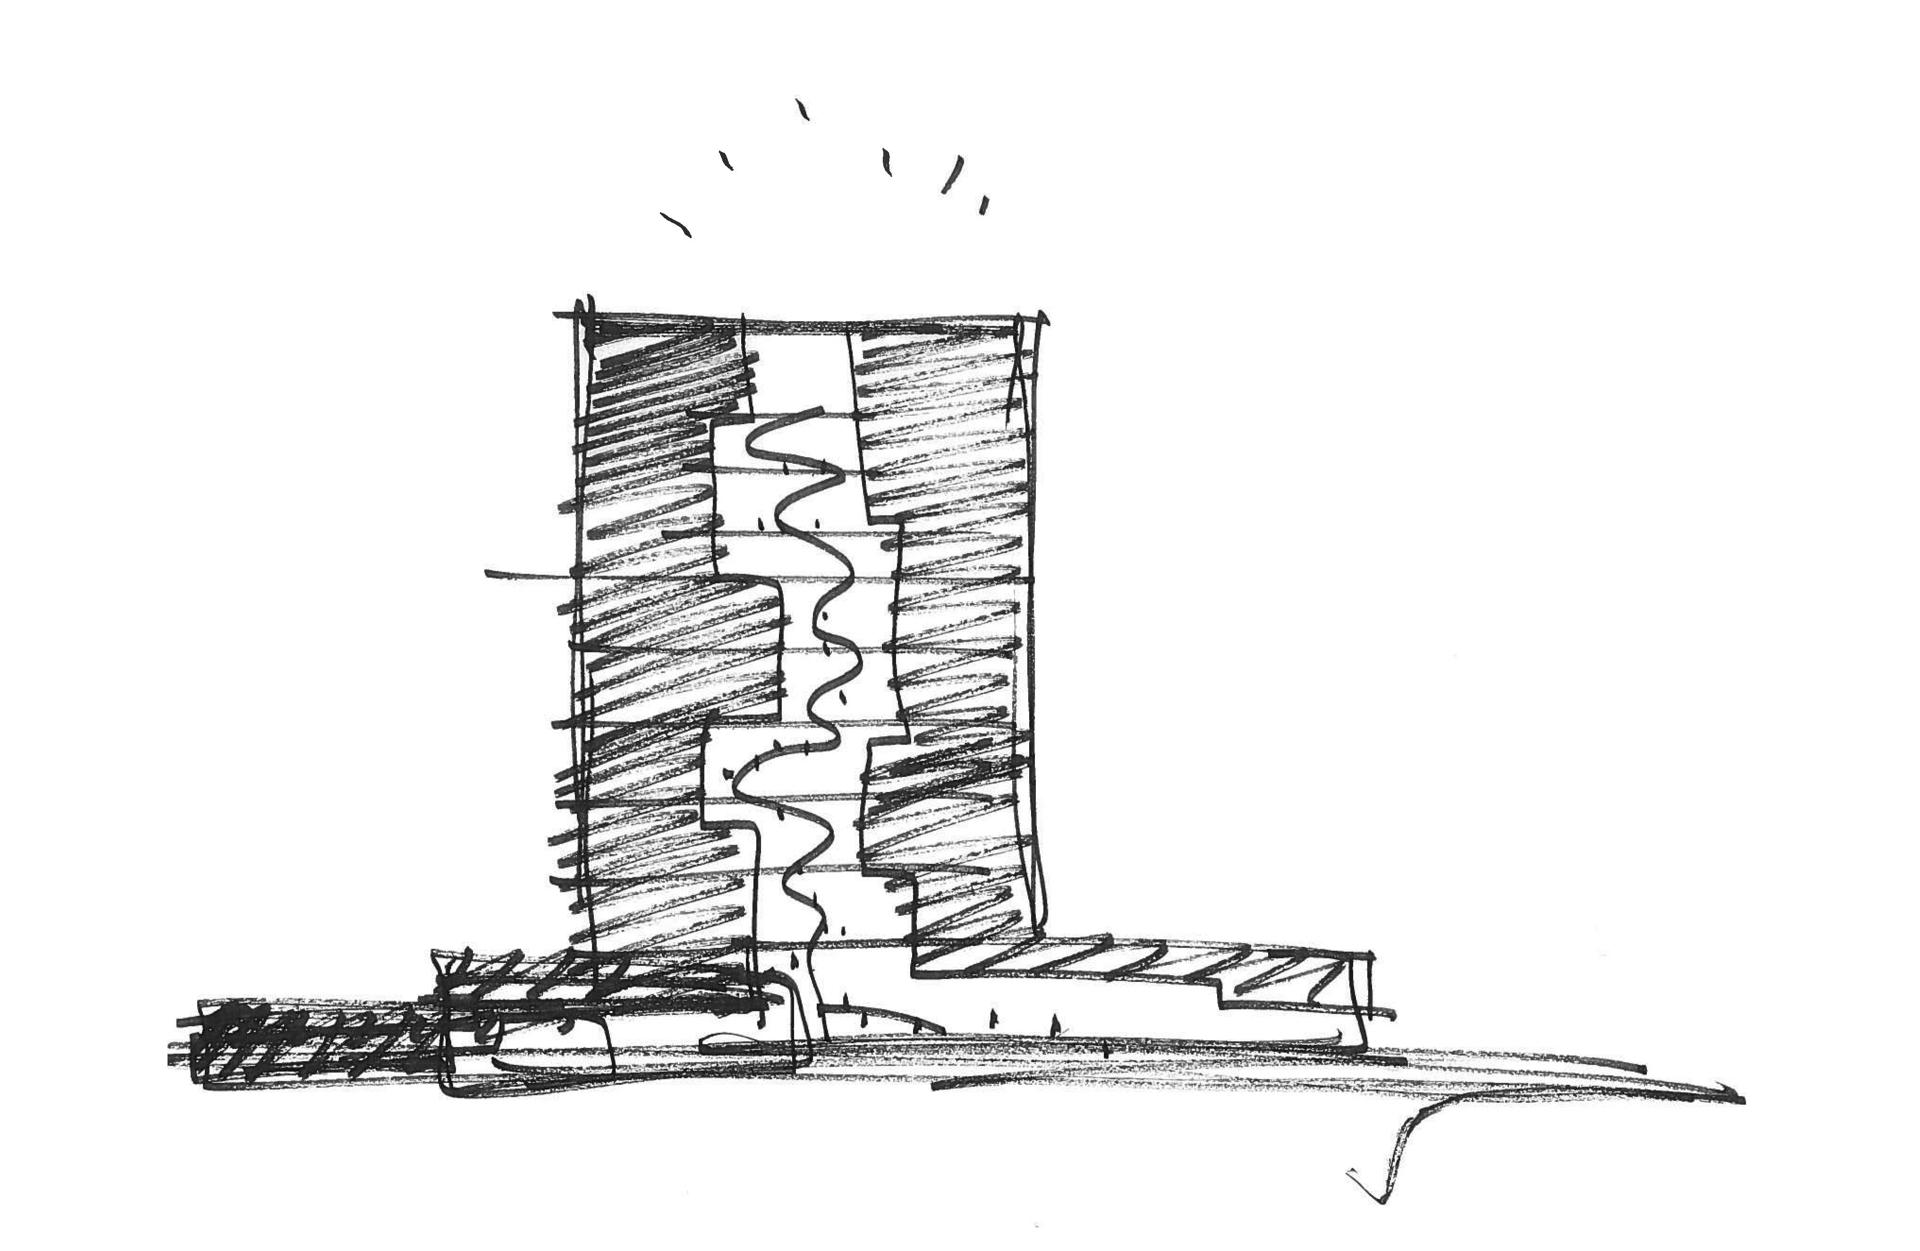 C.F. Møller: Maersk Tower, Panum Building in Copenhagen